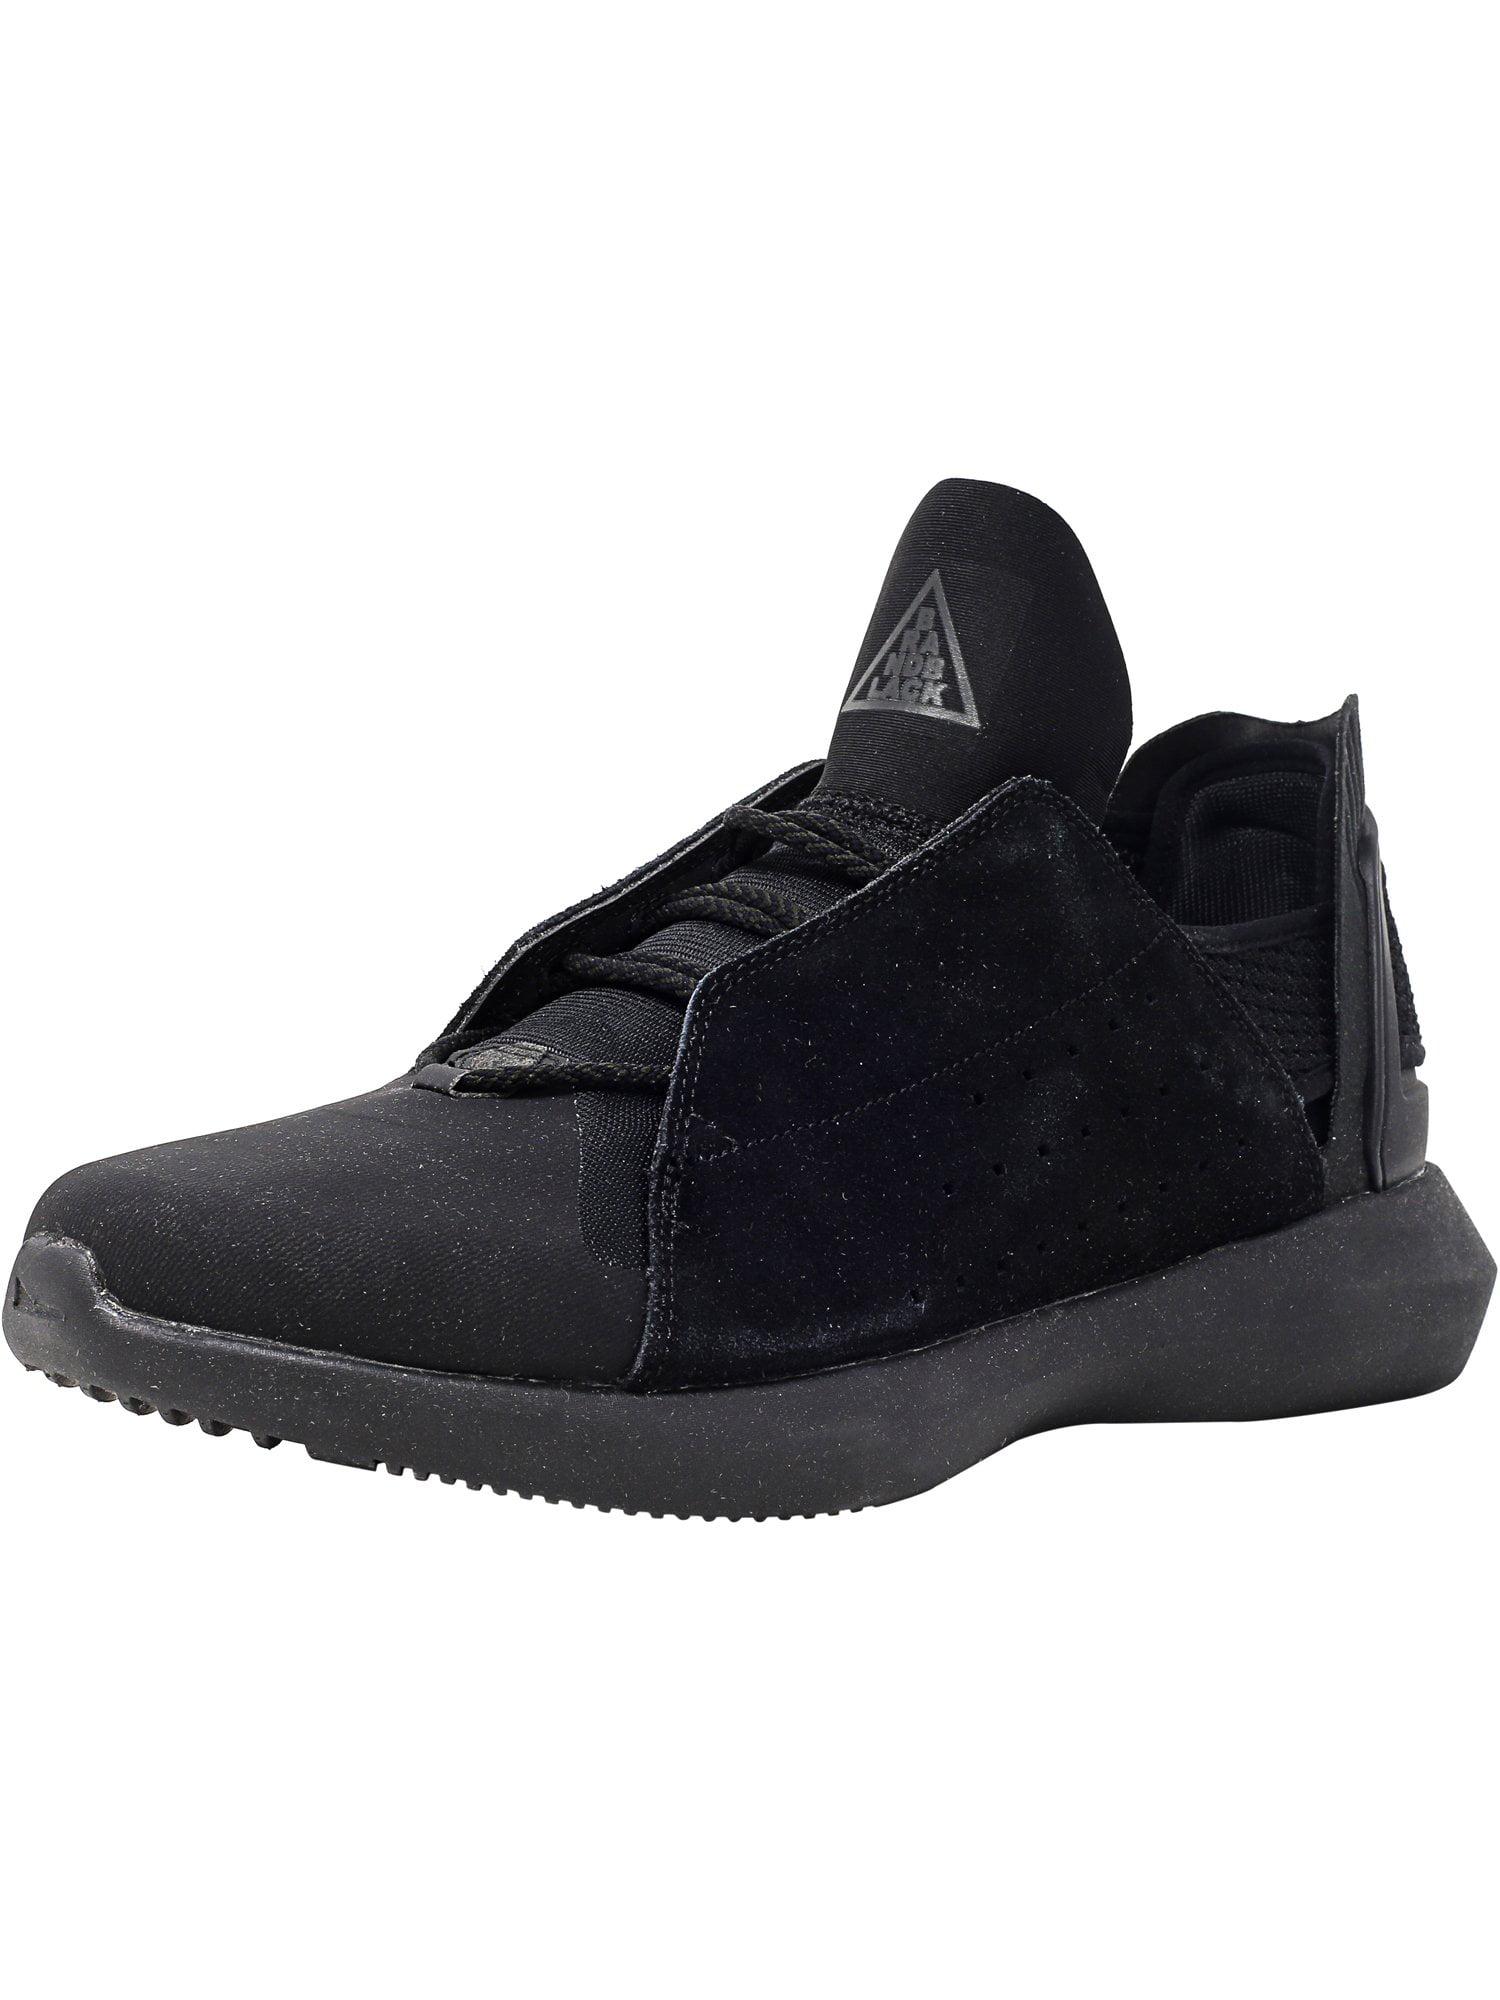 Brandblack Men's Gambetto Black Ankle-High Leather Tennis Shoe - 10WW